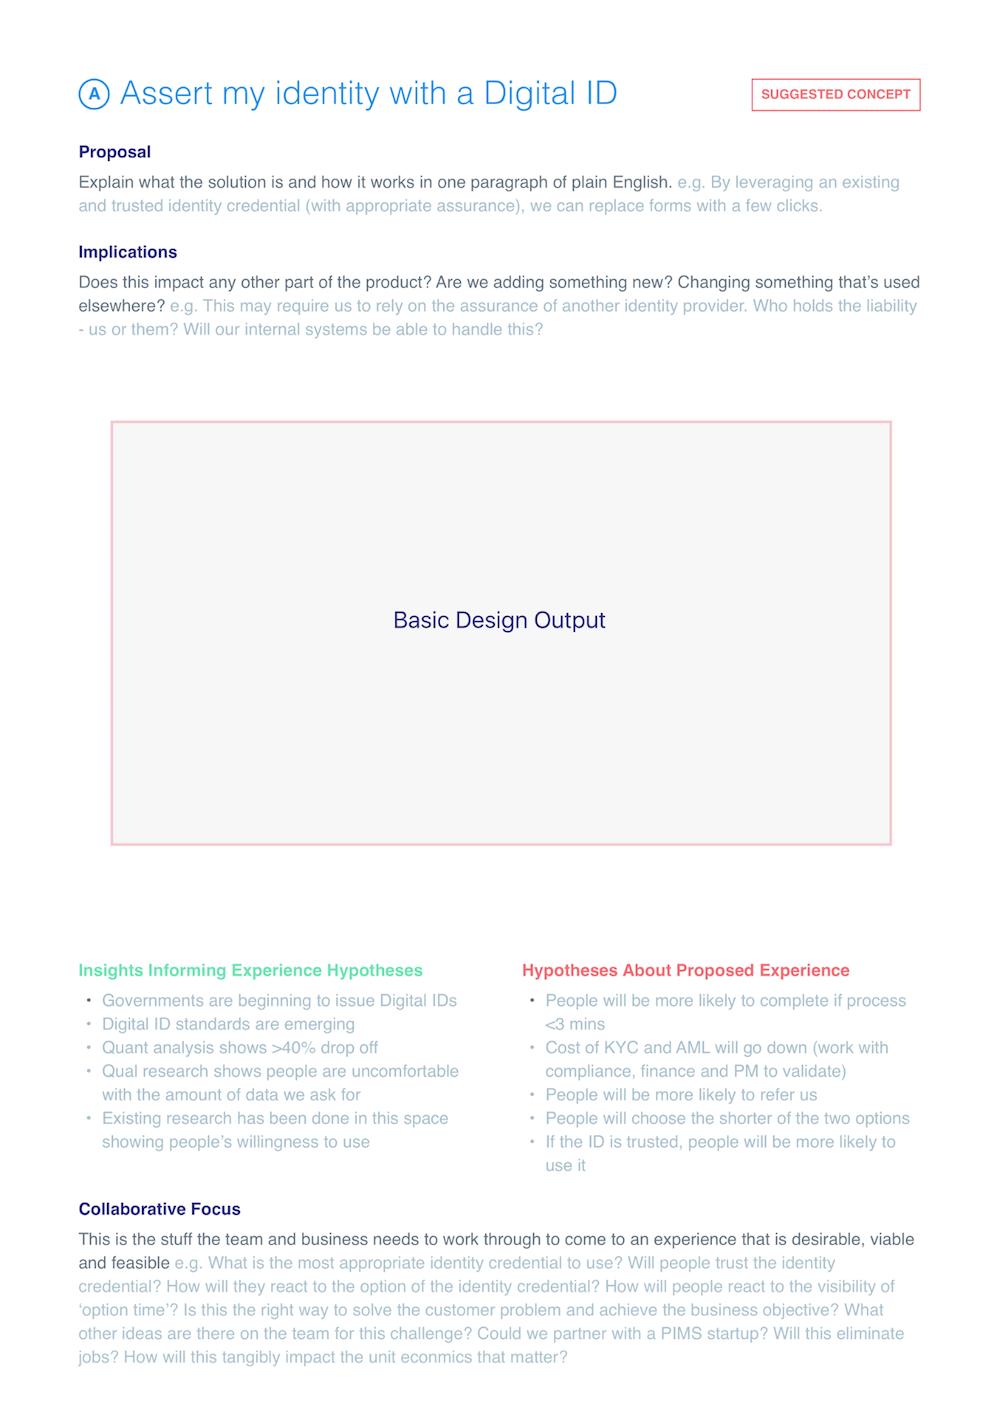 Rationalize design